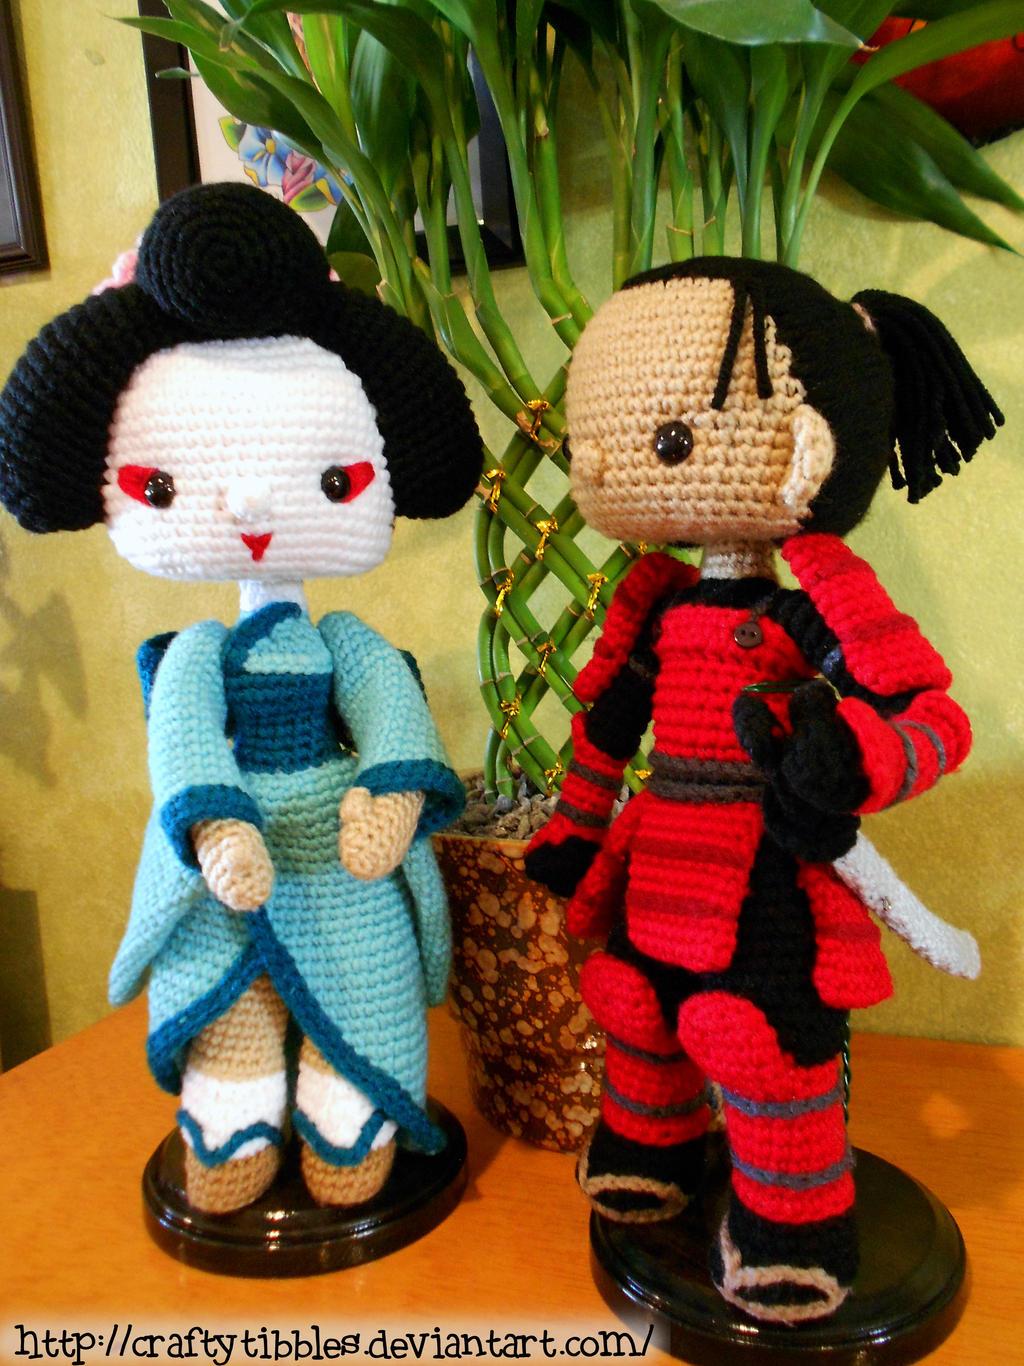 Geisha and Samurai by CraftyTibbles